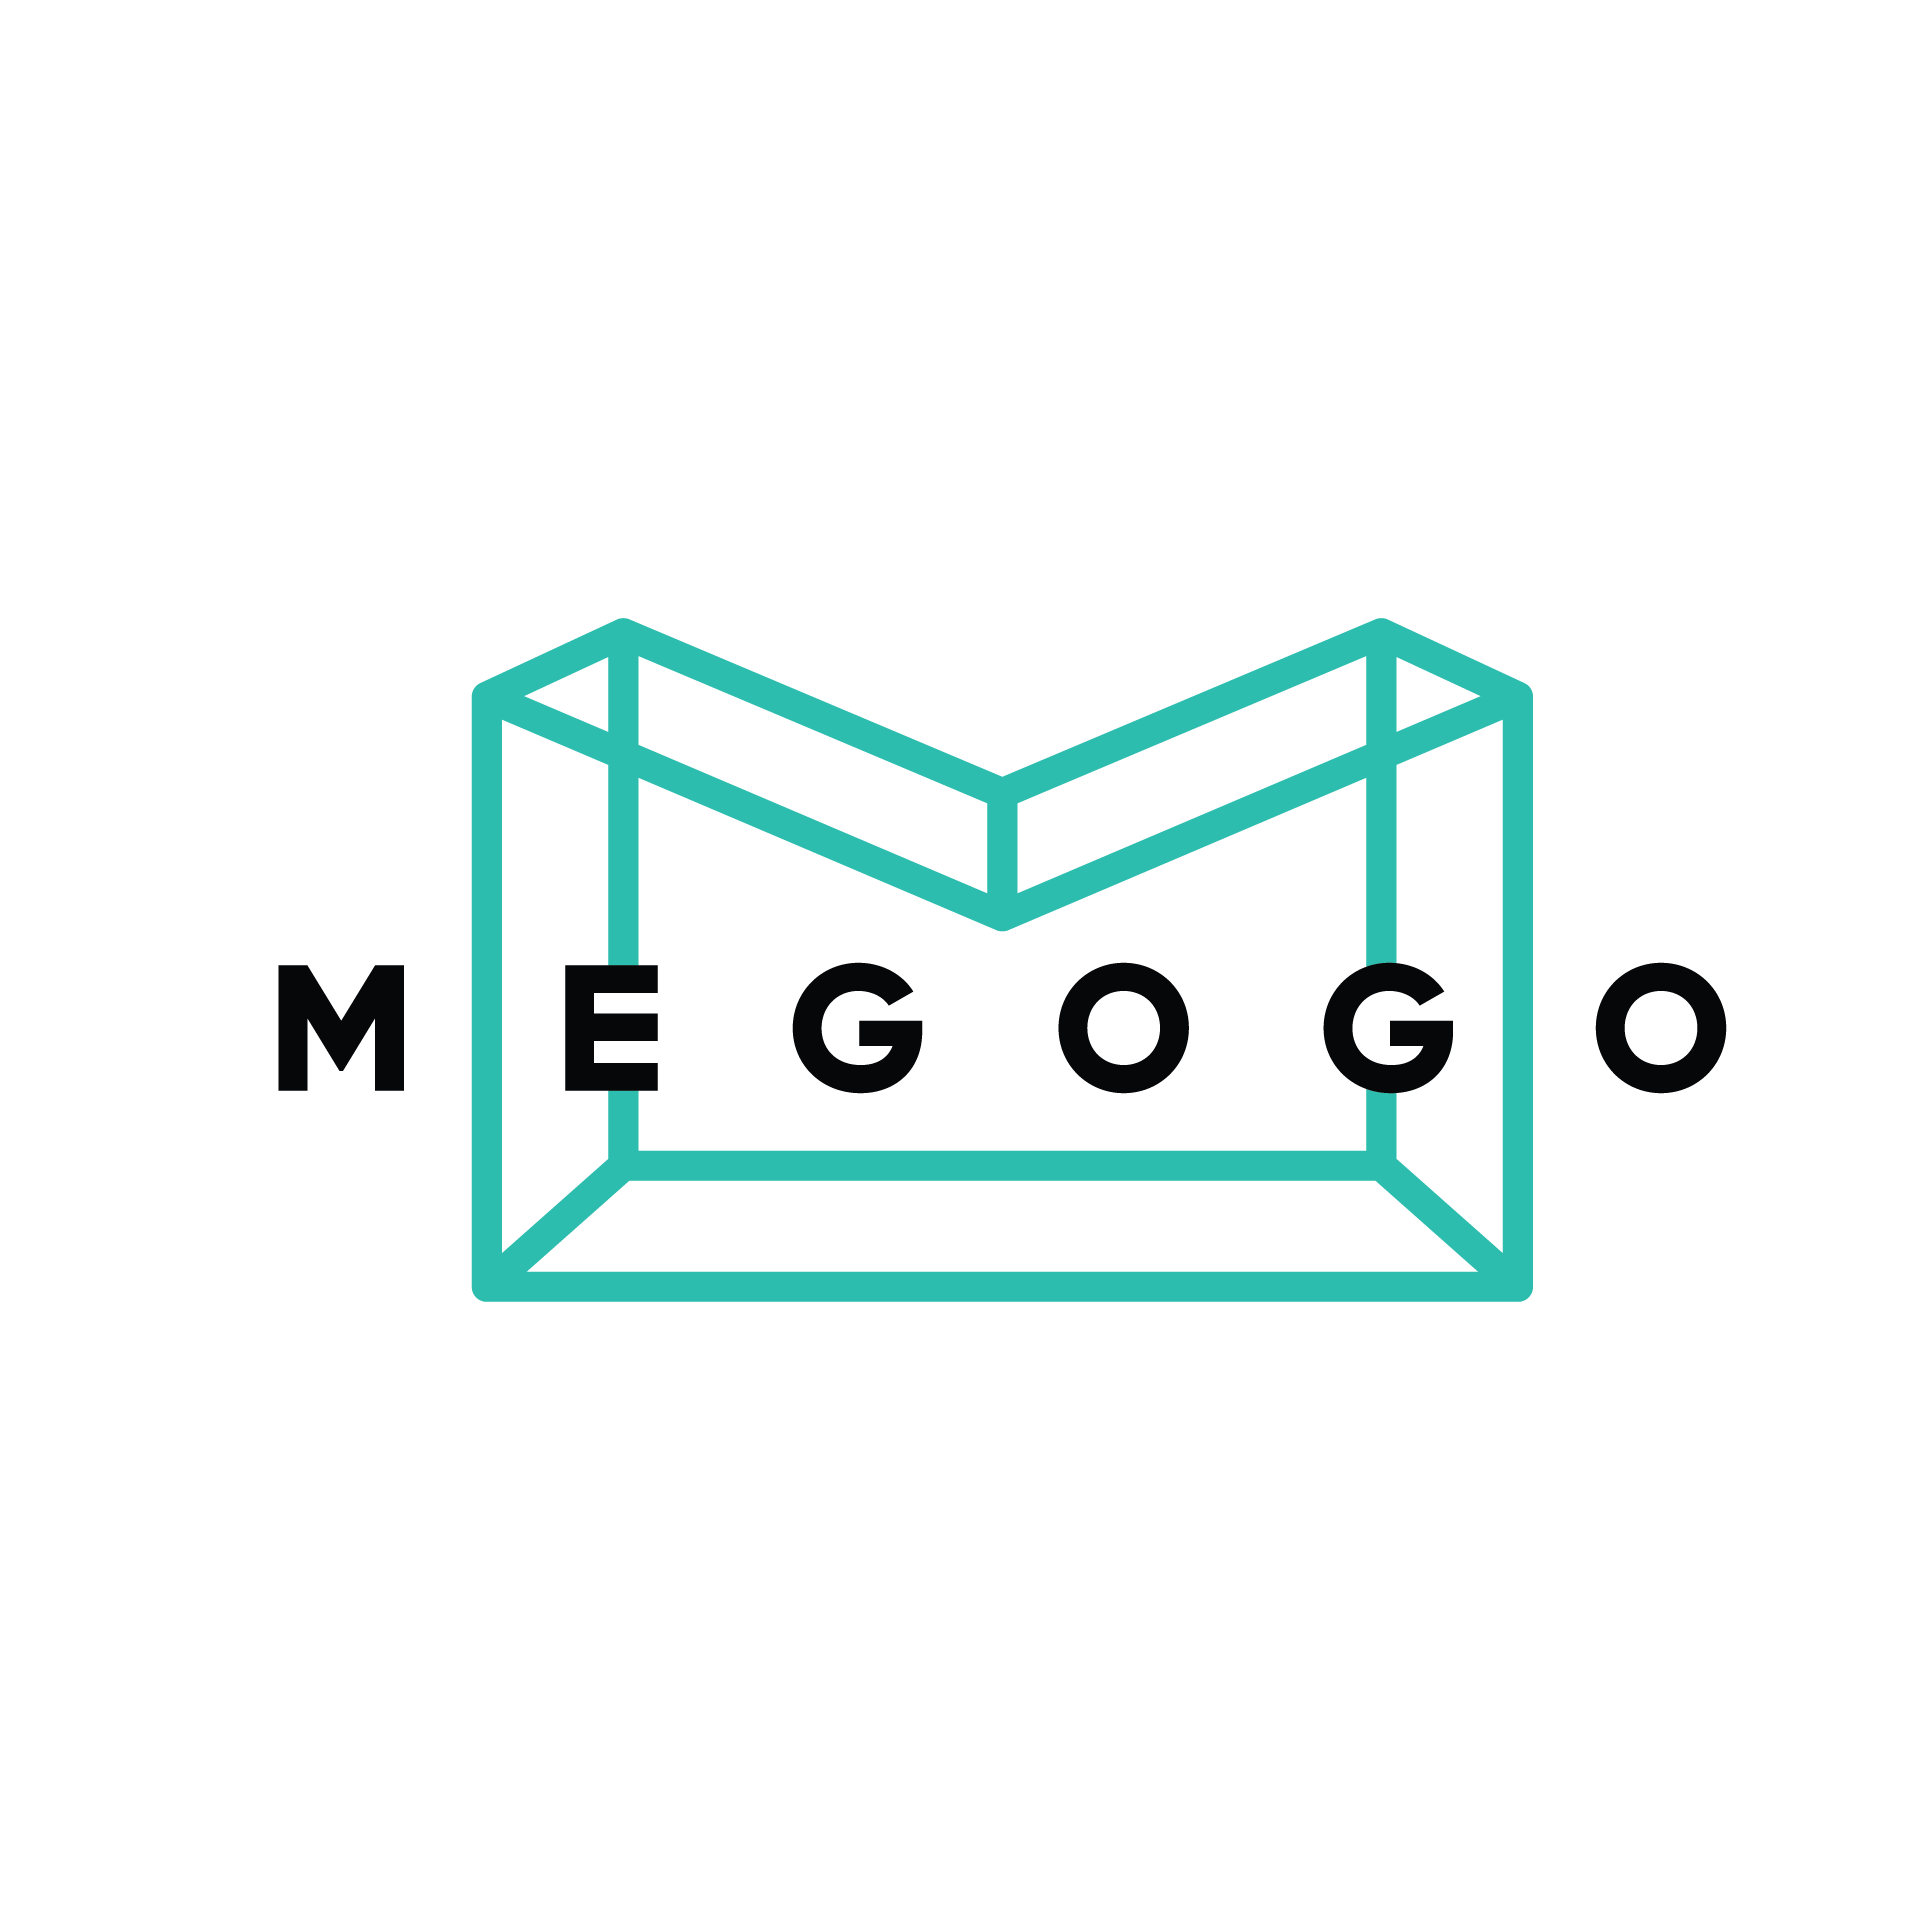 megogo logo | мегого лого| netgroup